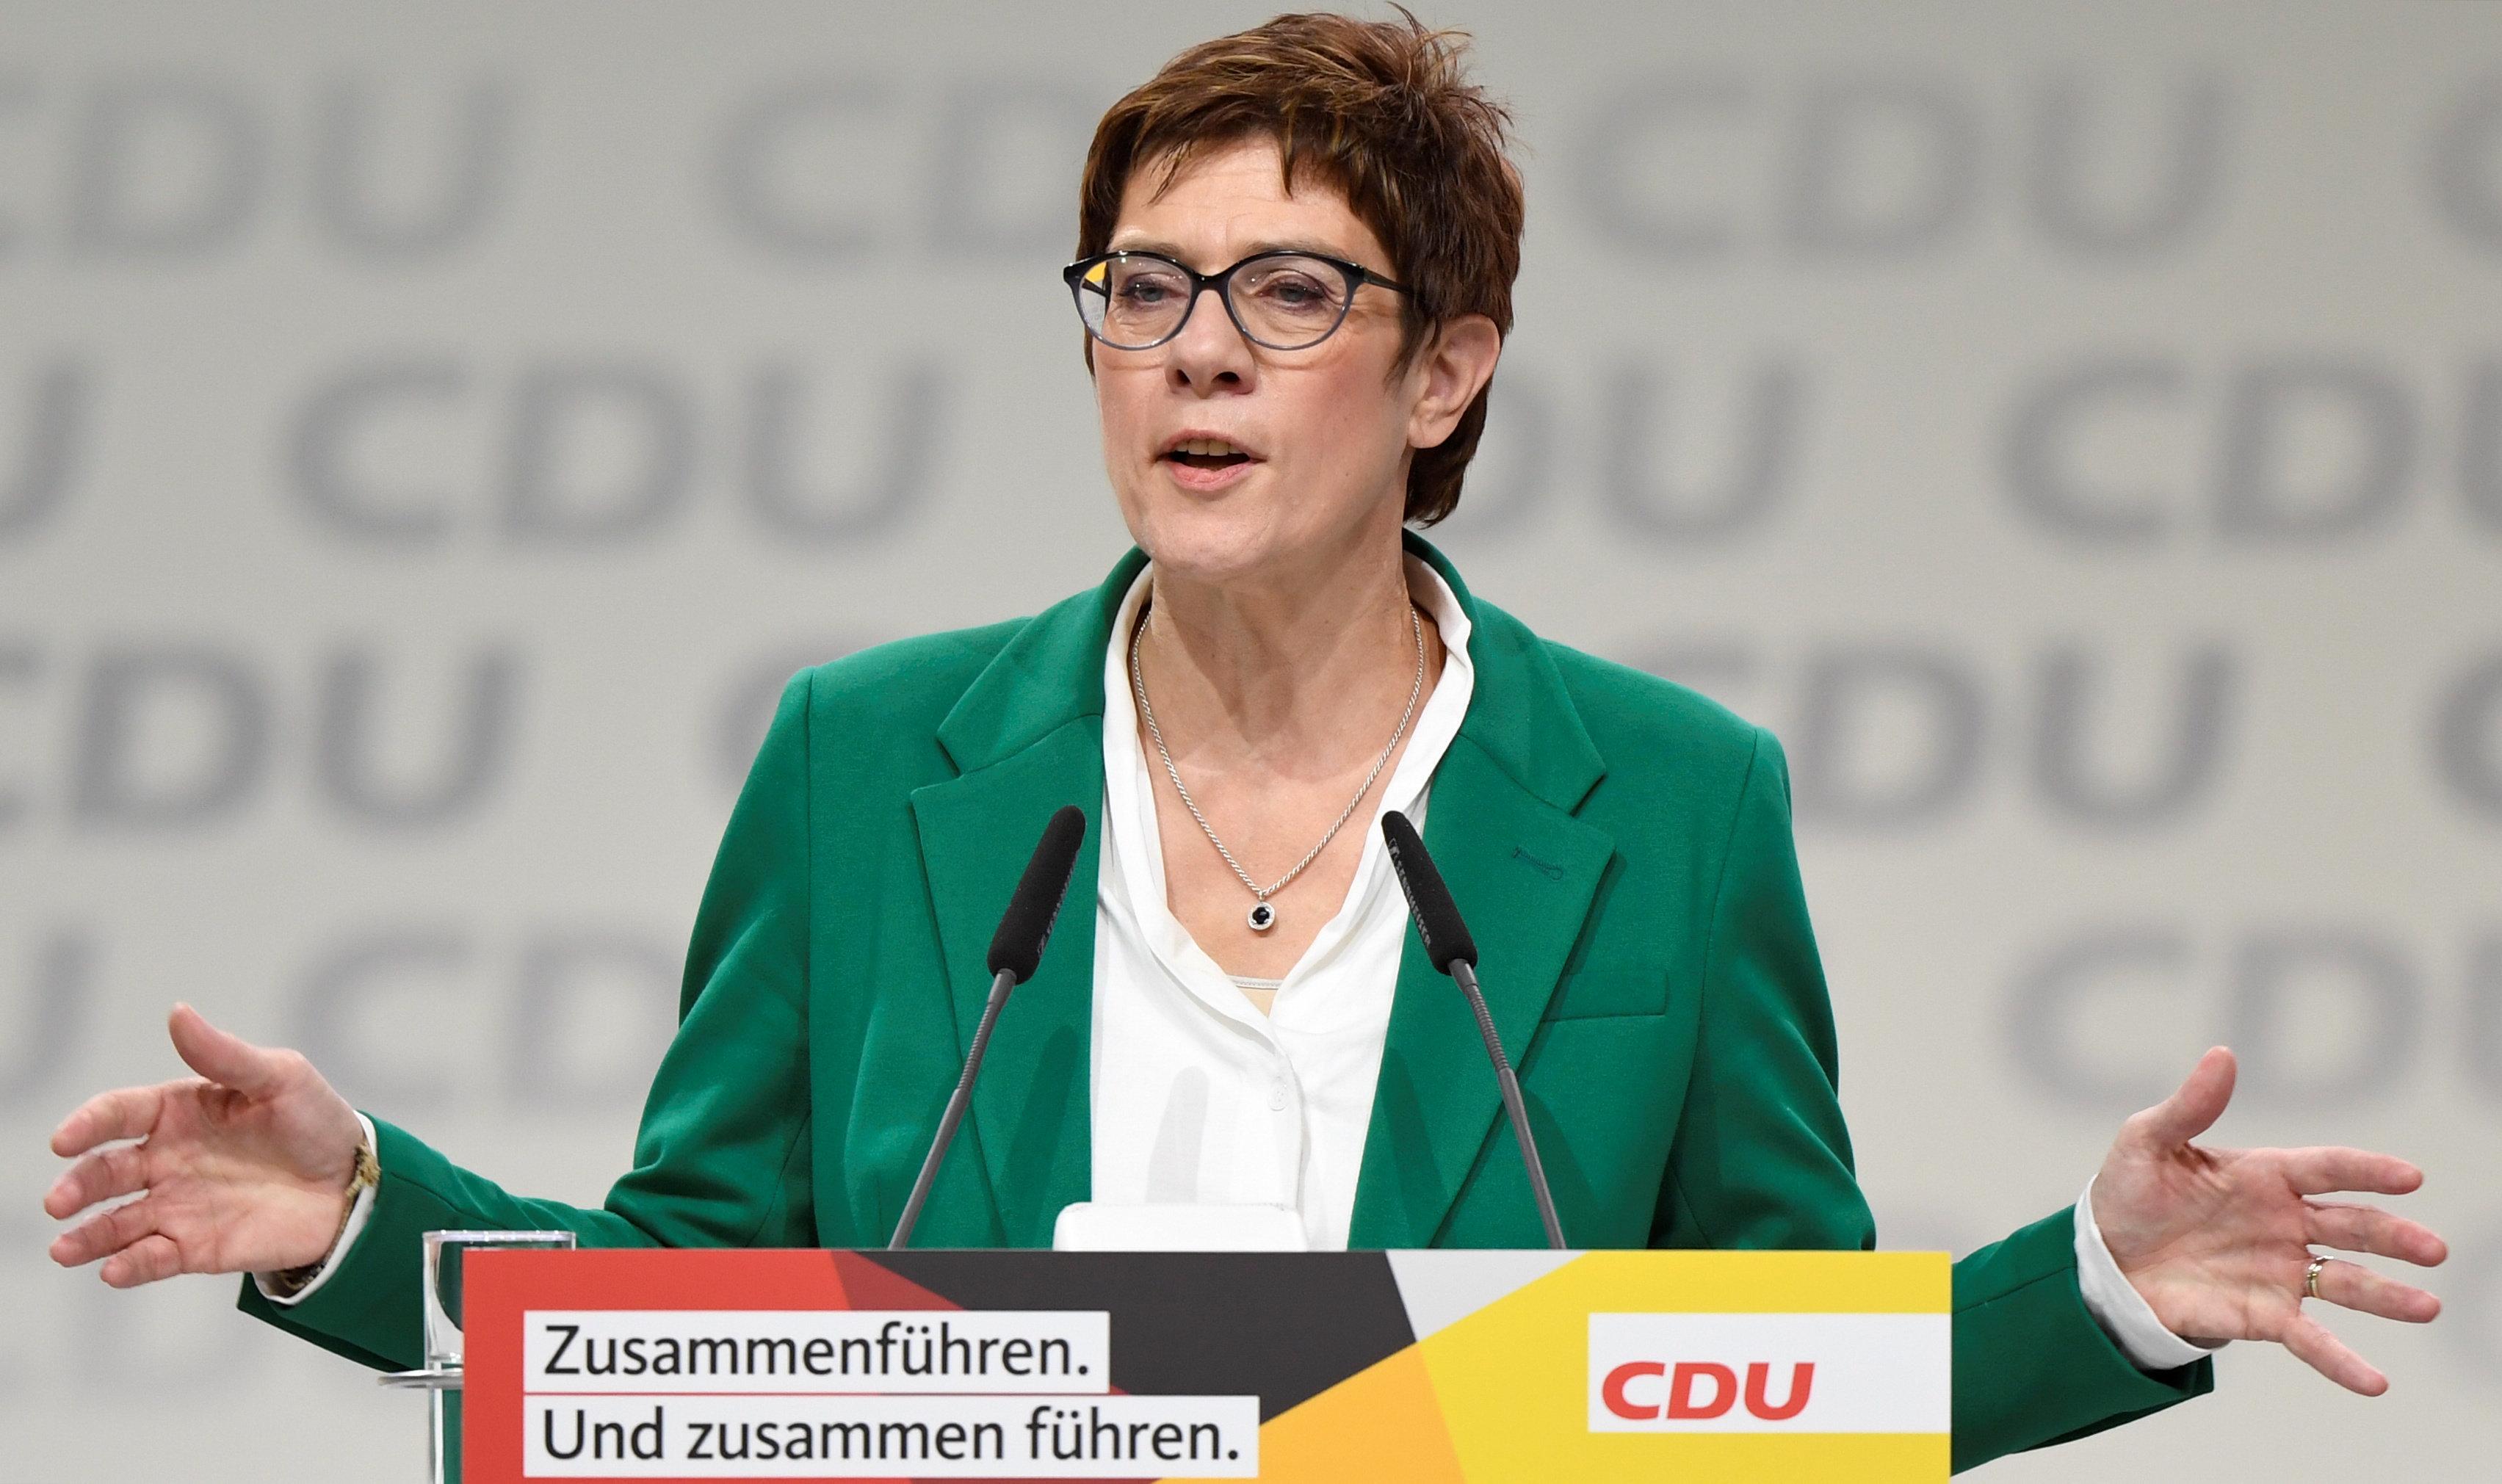 Angela Merkel's Successor Leads German Plea For 'British Friends' To Remain In The